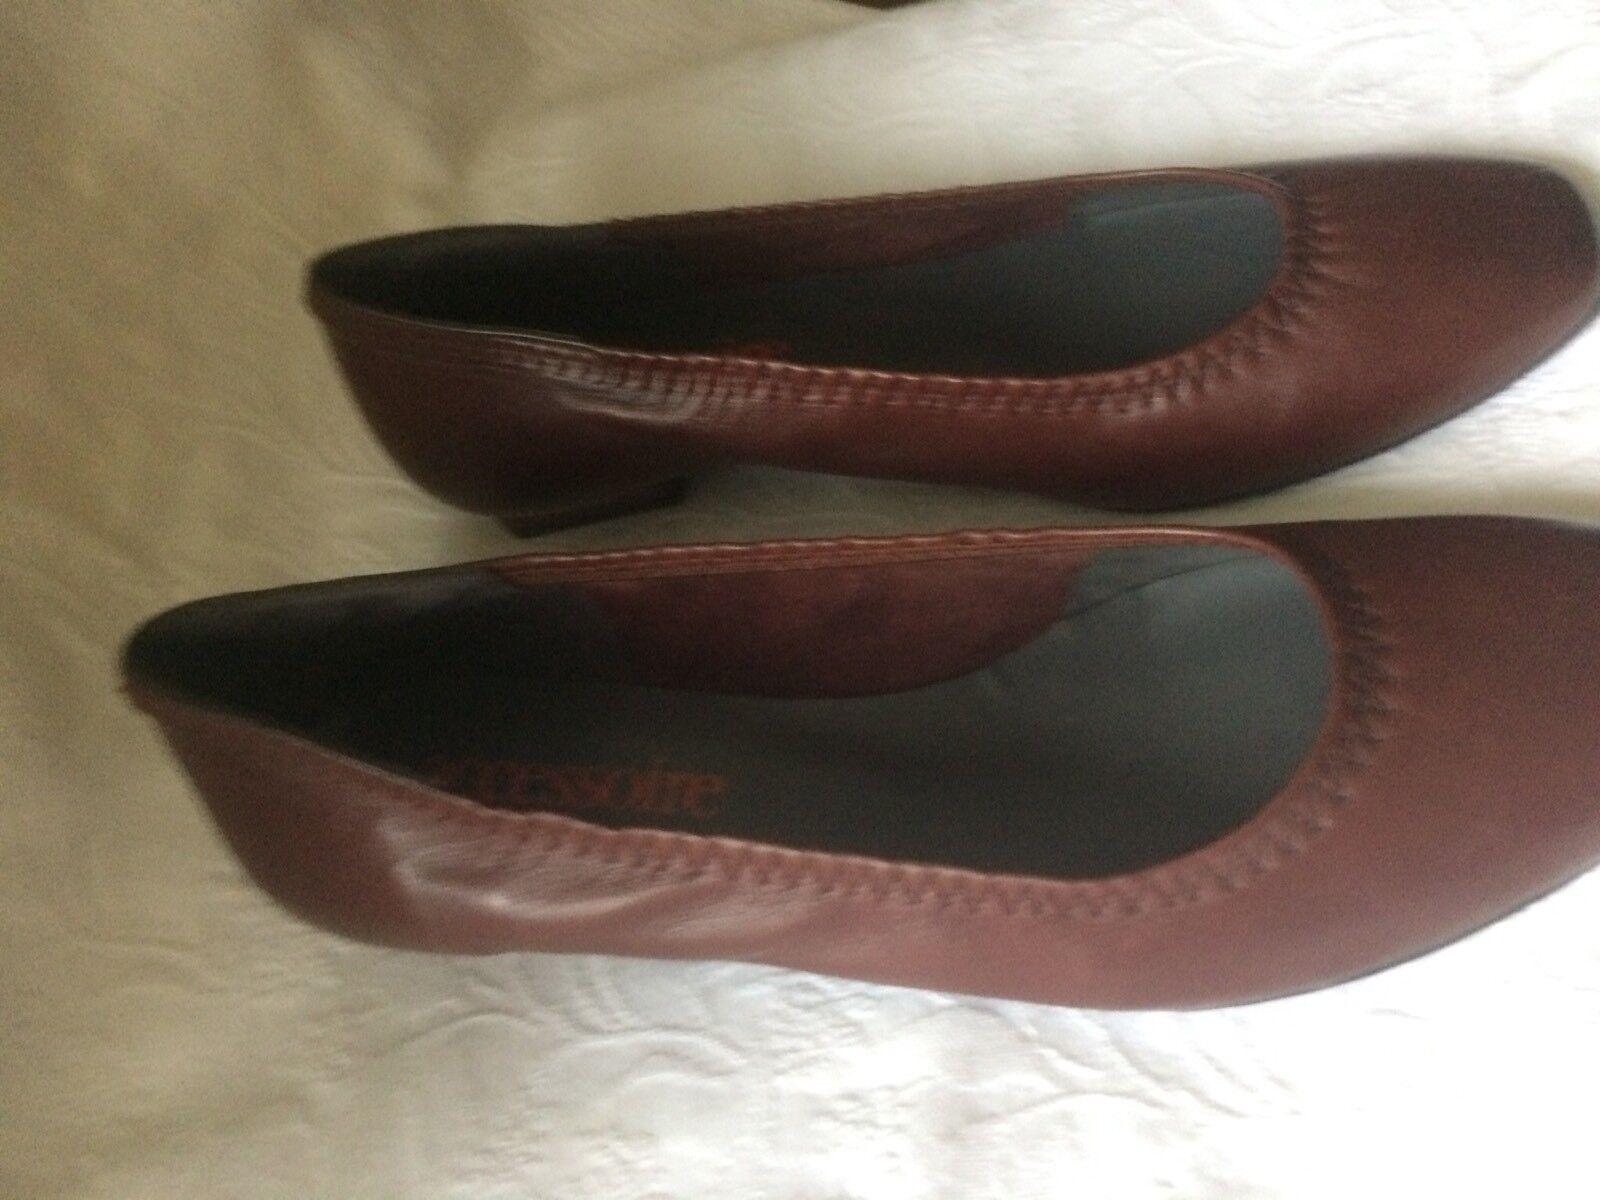 Accessoire Diffusion zapatos Pointure 37 Tout Cuir marrón Neuves Neuves Neuves 0ada3f